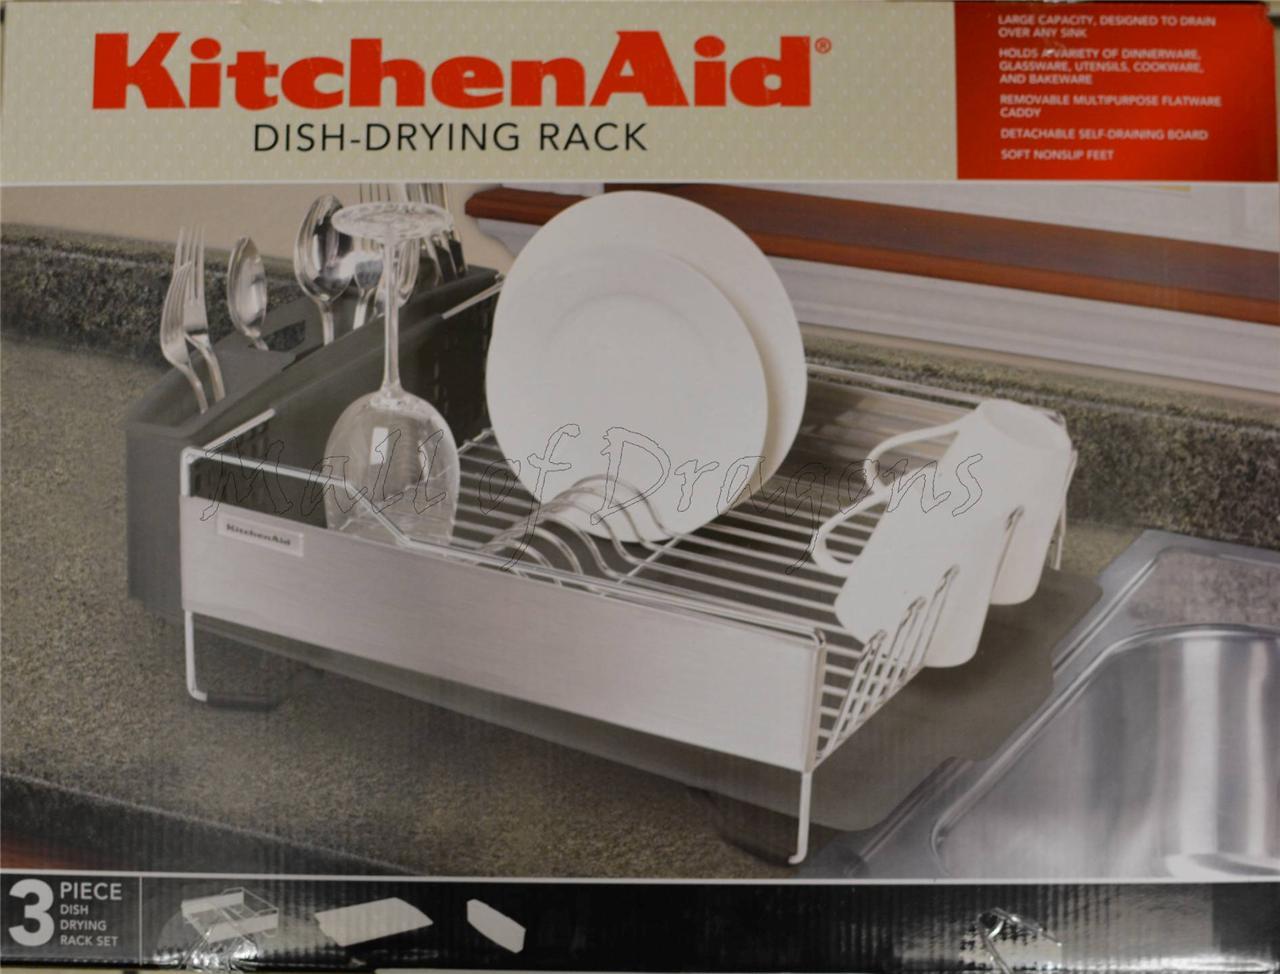 Brand New Kitchenaid Dish Drying Rack 3 Piece Black Dish Drainer